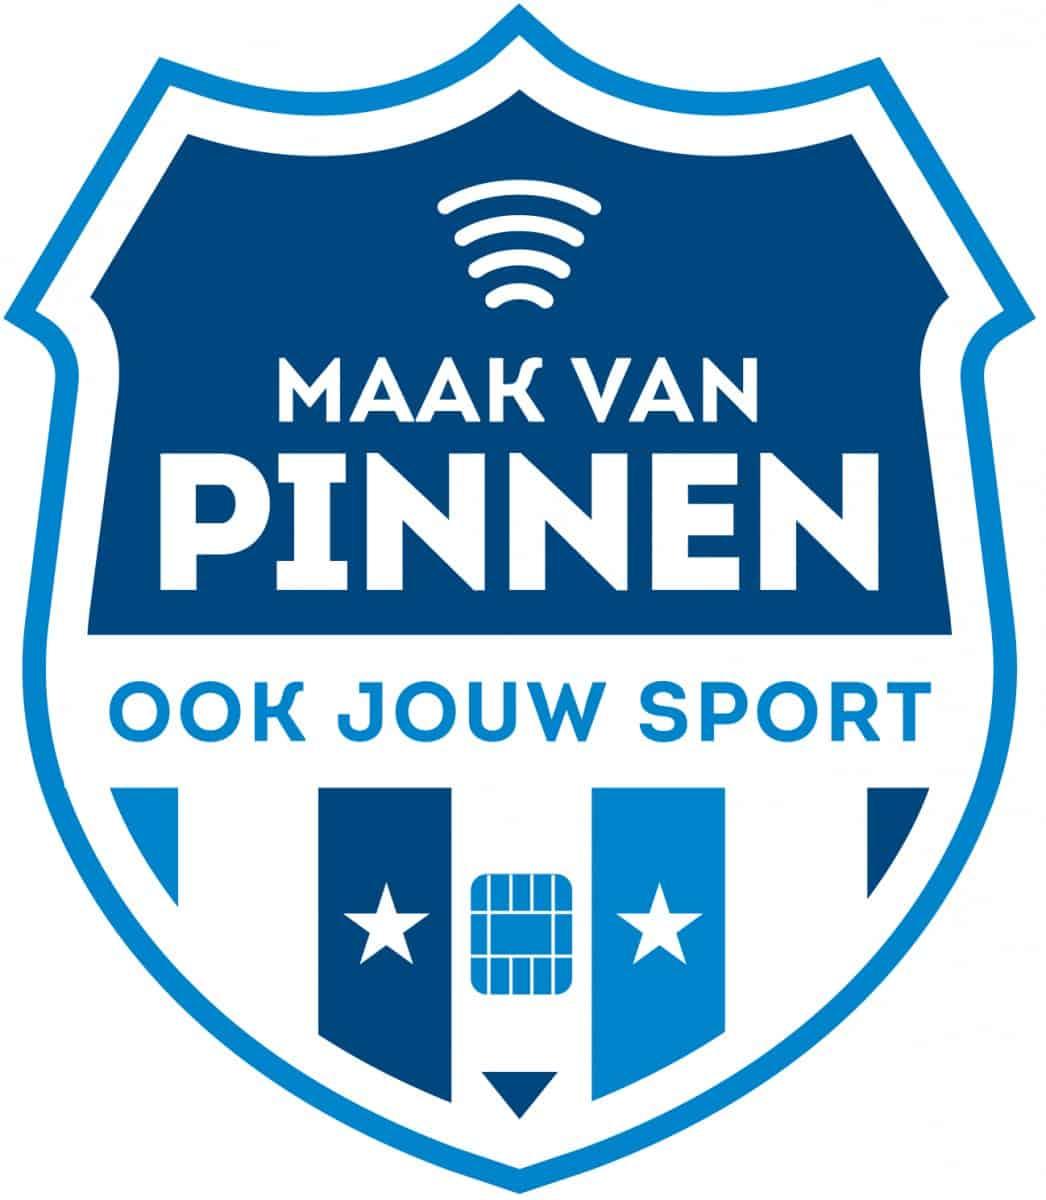 svh hellendoorn Logo_MaakVanPinnenOokJouwSport